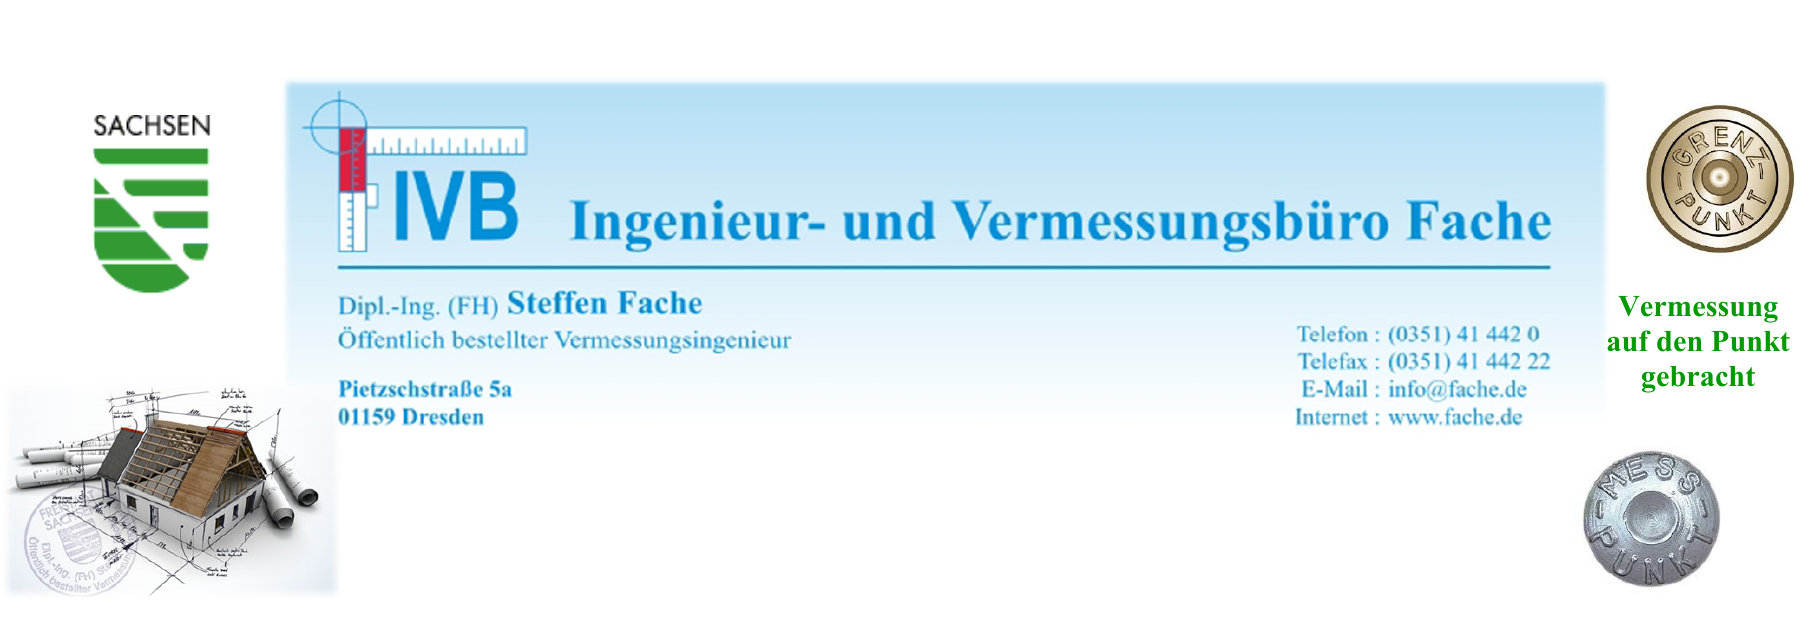 35-IVB_Fache